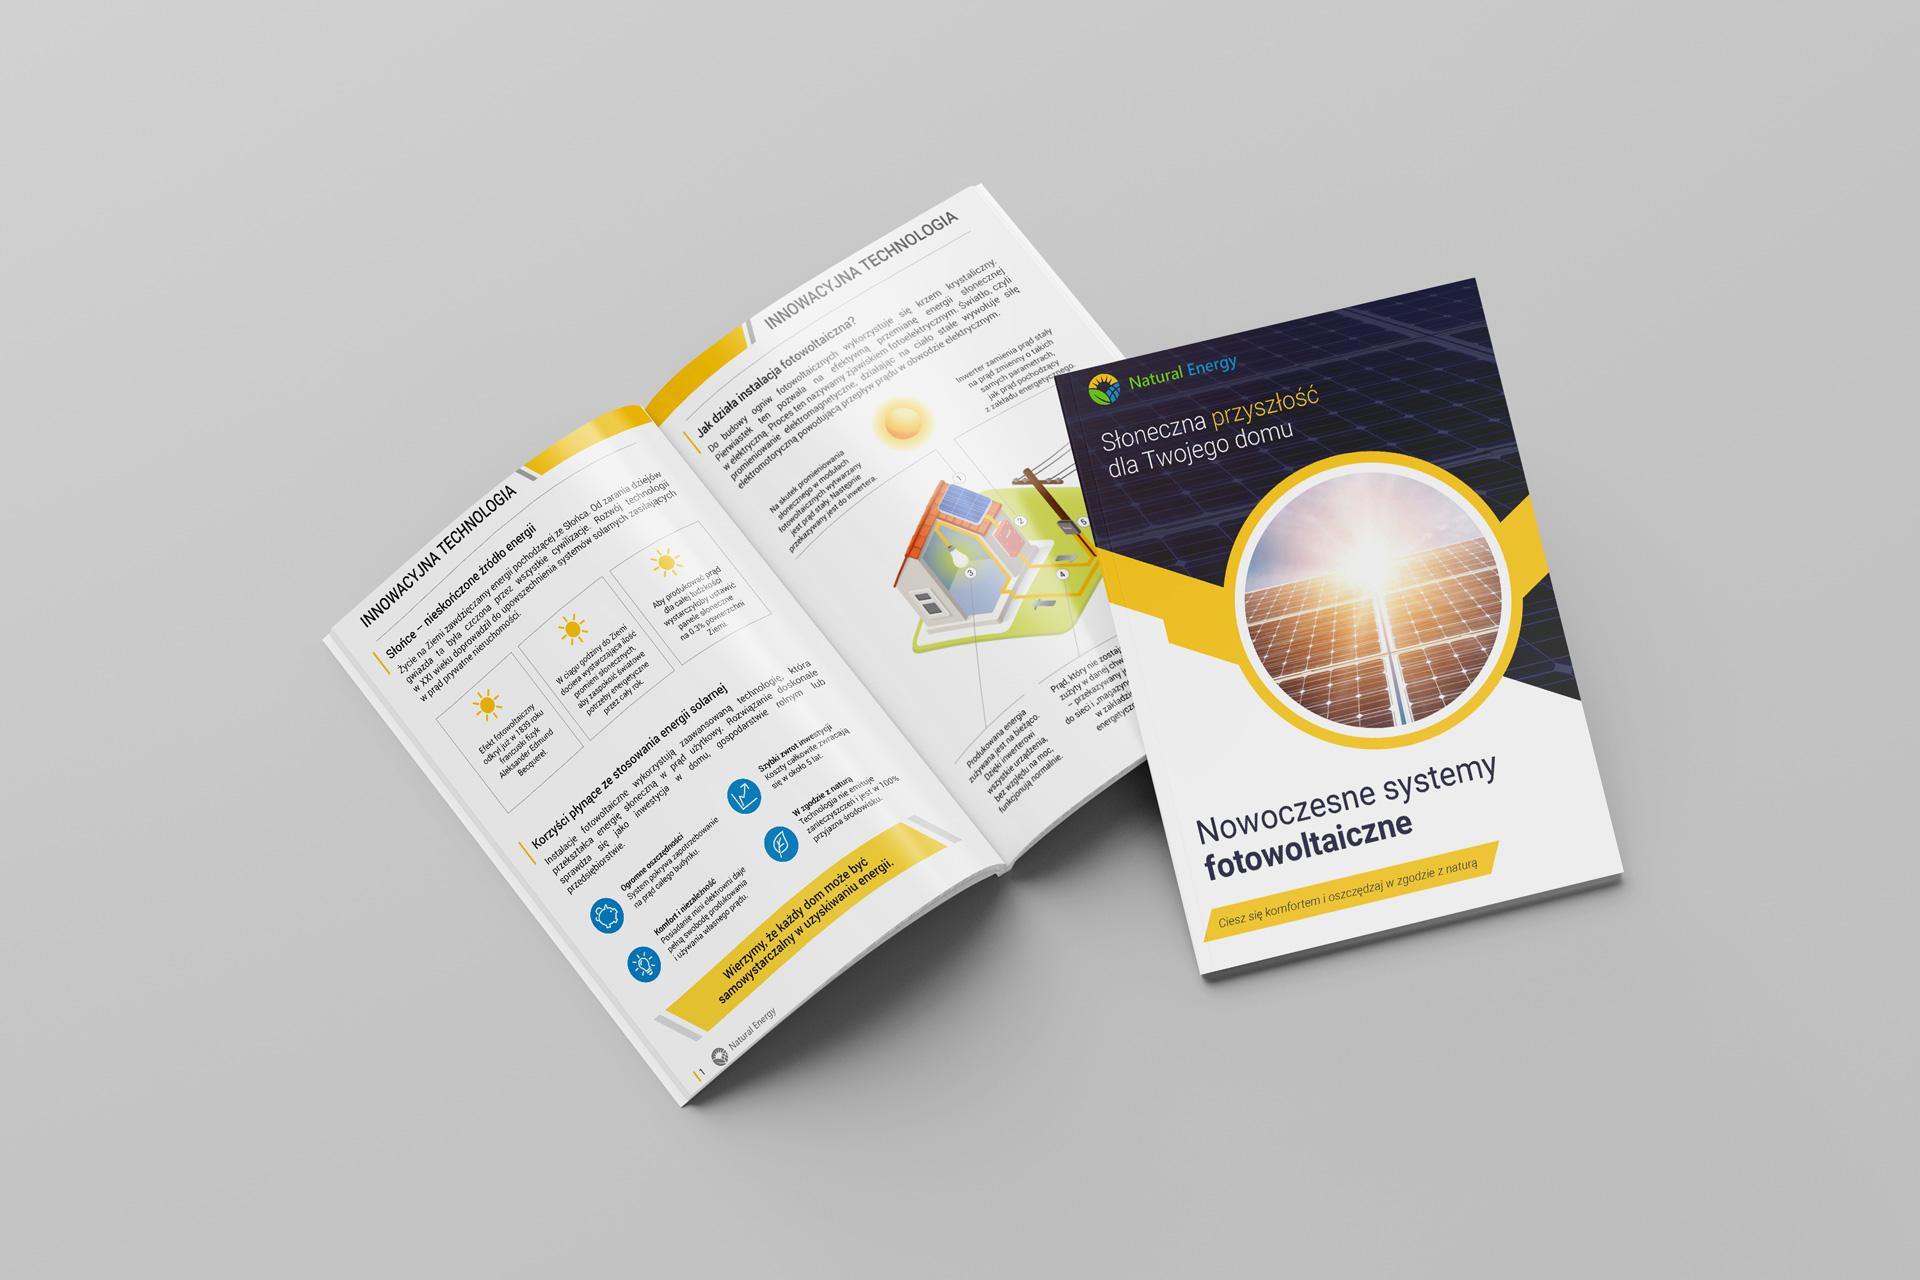 Projektowanie-graficzne-Natural-Energy-Katalogi-reklamowe-6